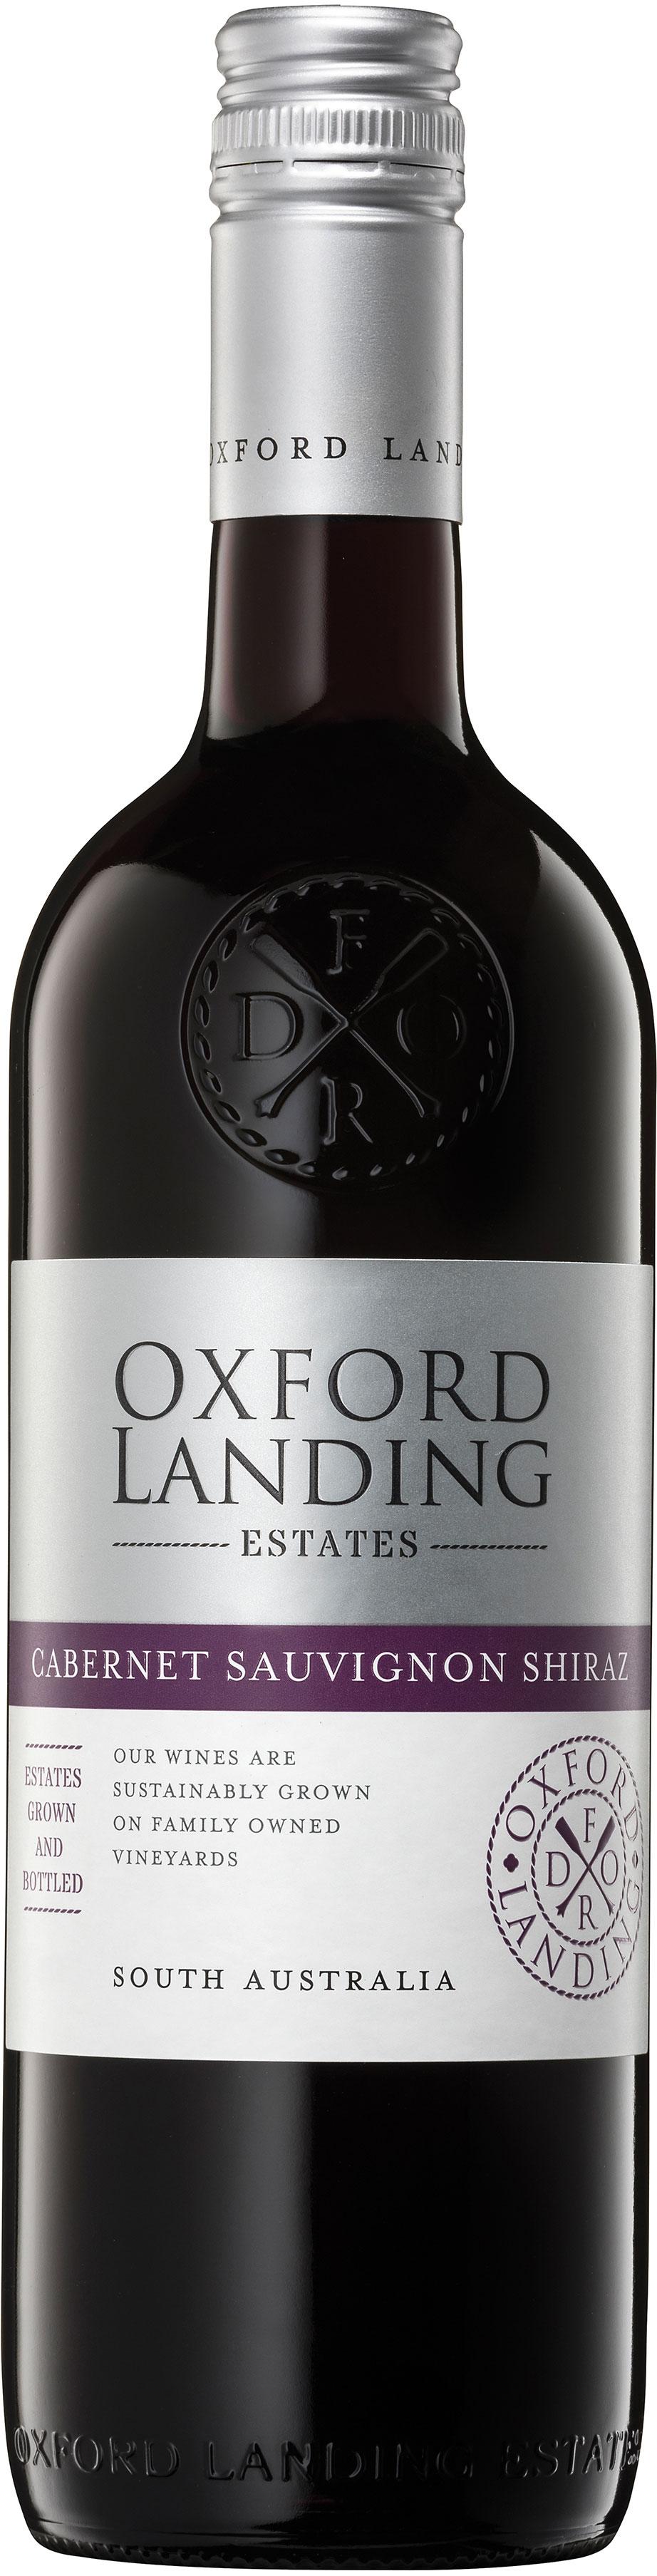 https://vinocorpperu.com/images/vinos/oxfordlanding/oxford_landing_estates_cabernet_shiraz_2016.jpg